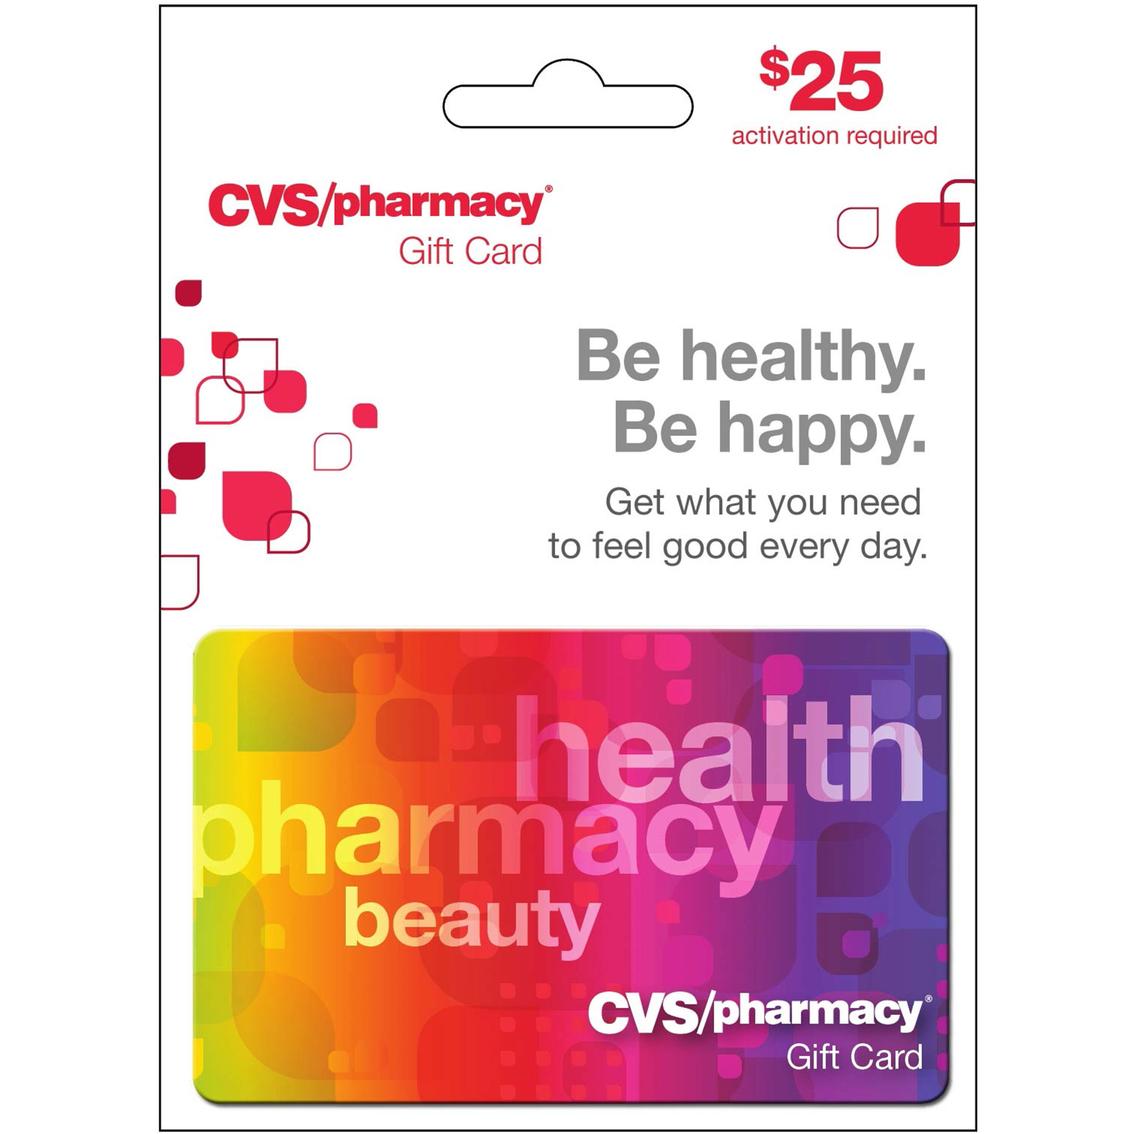 cvs gift card personal care beauty health shop the exchange. Black Bedroom Furniture Sets. Home Design Ideas